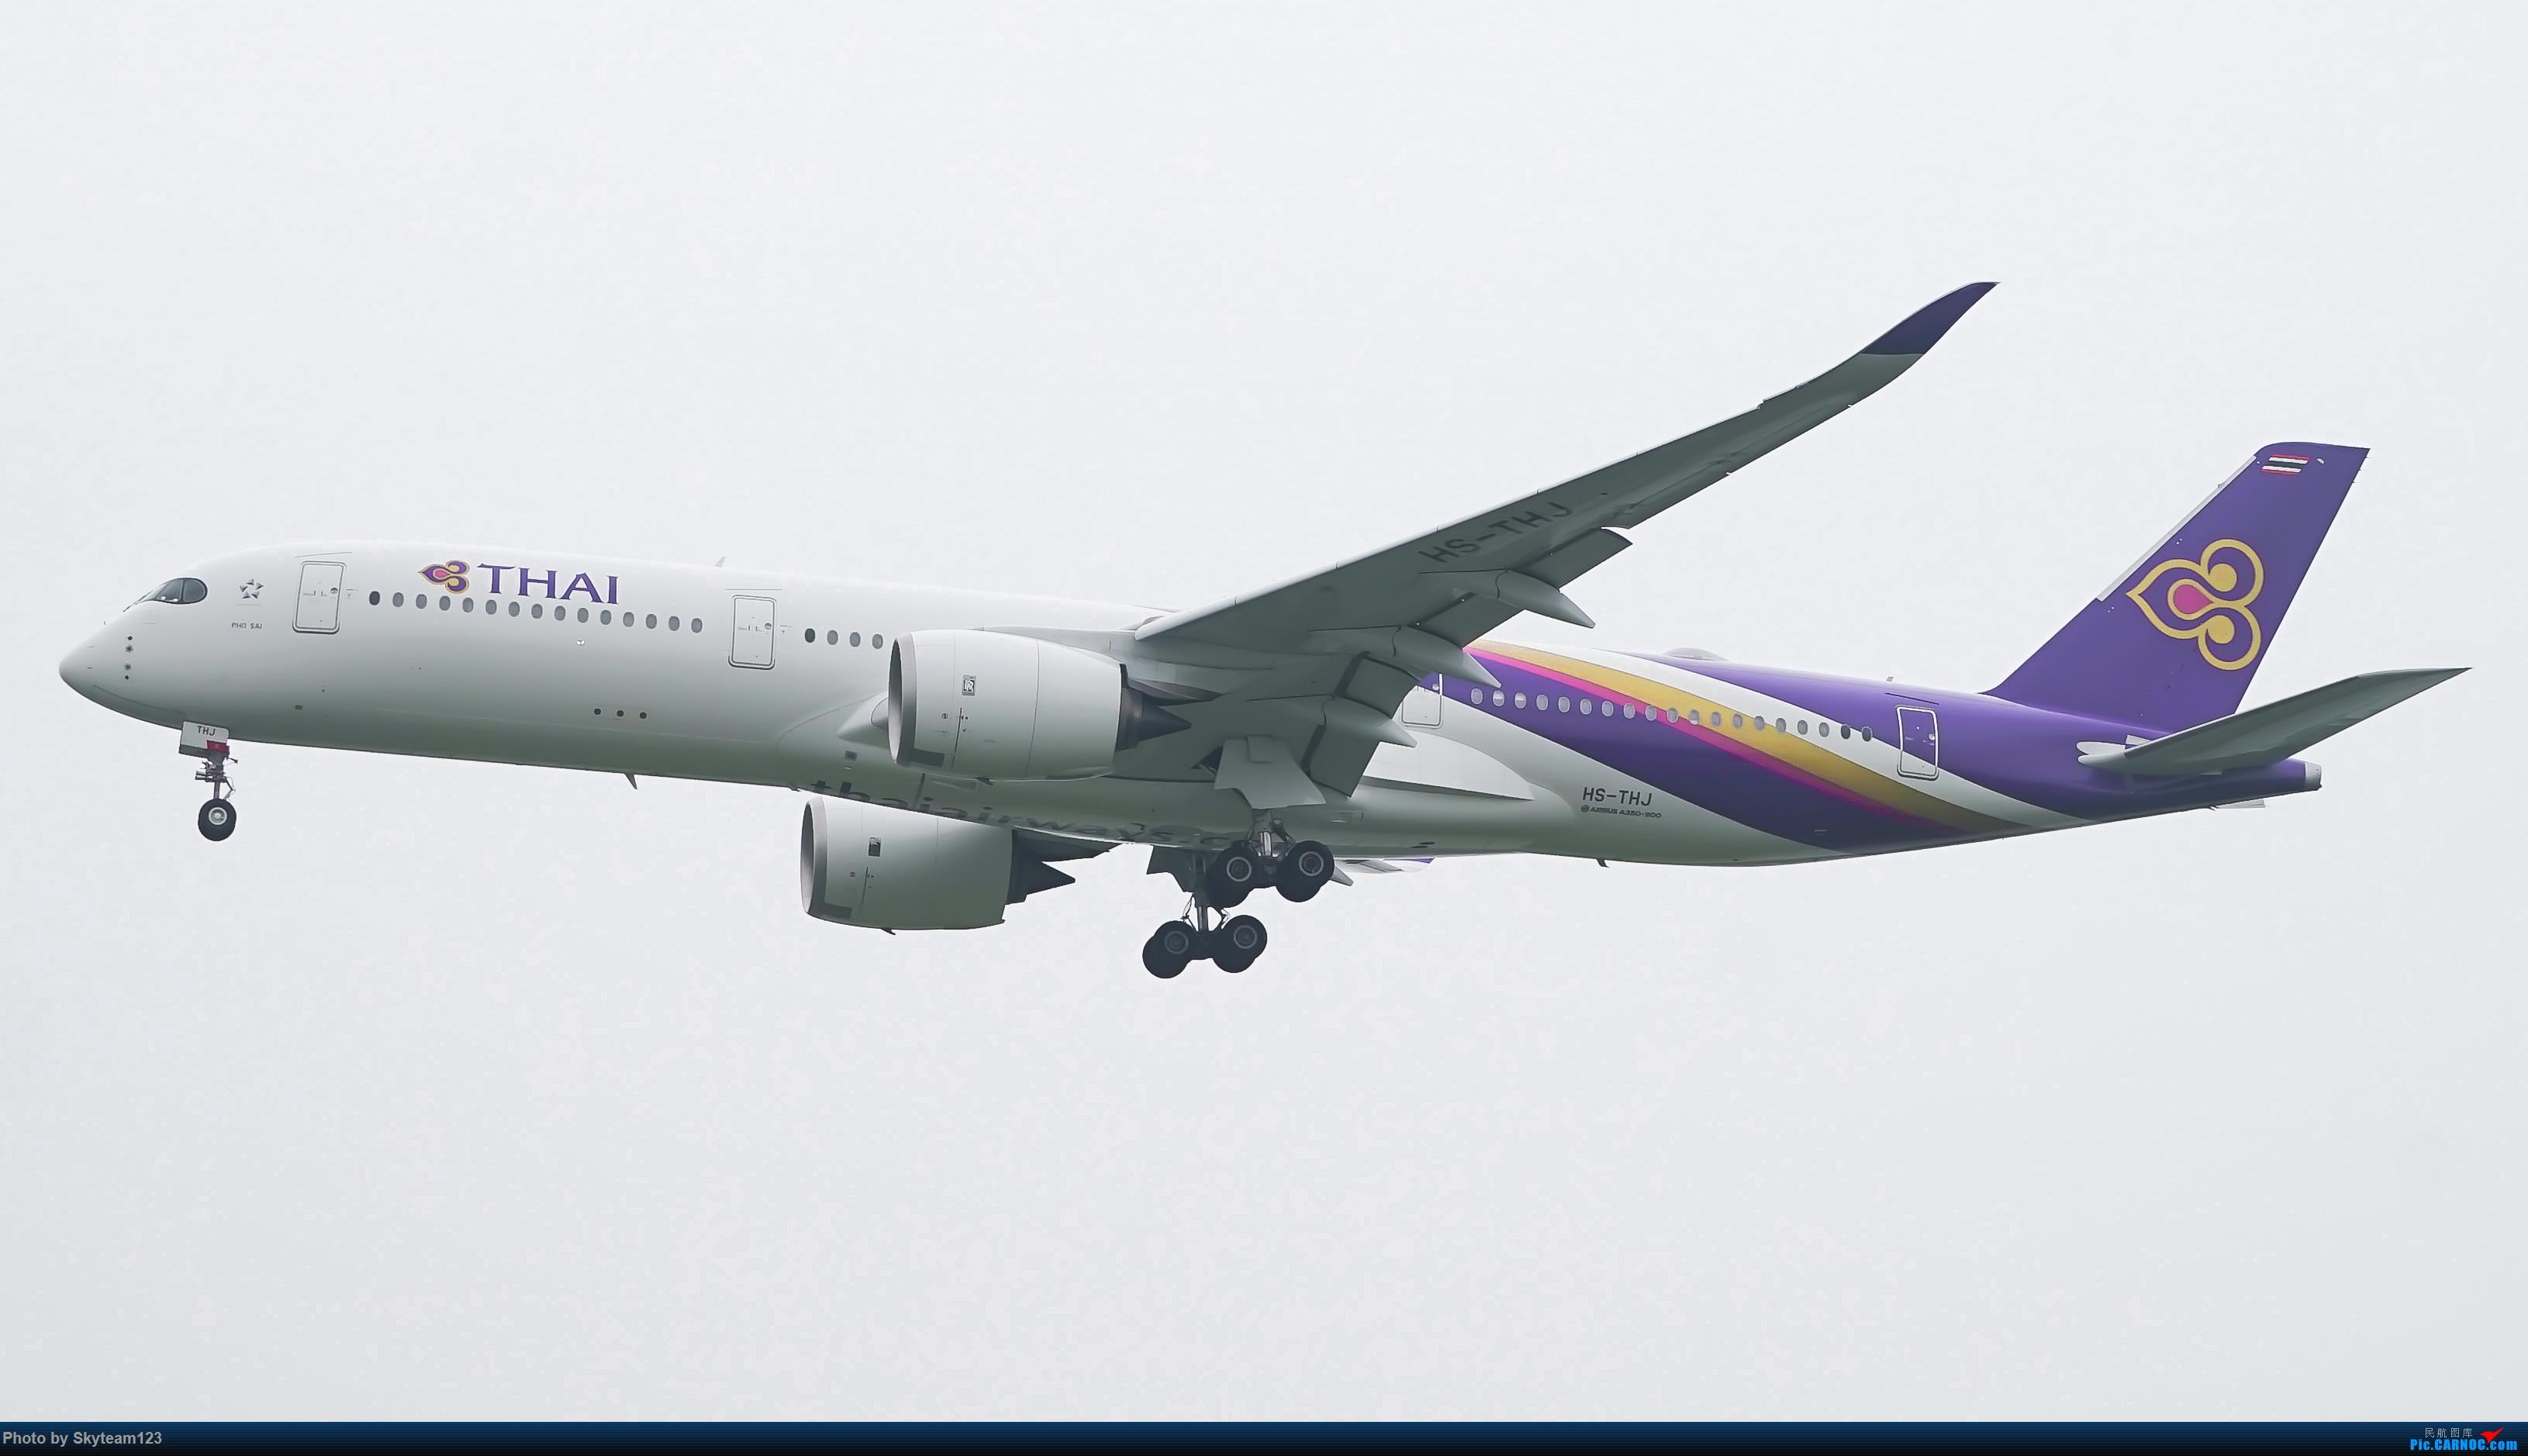 Re:《Simon游记》第六季第八集 CZ3101&CZ3000 南航全新波音78W经济舱体验&详细测评 PEK八卦台烂天拍机 及回程A388上层公务舱记录 AIRBUS A350-900 HS-THJ 中国北京首都国际机场